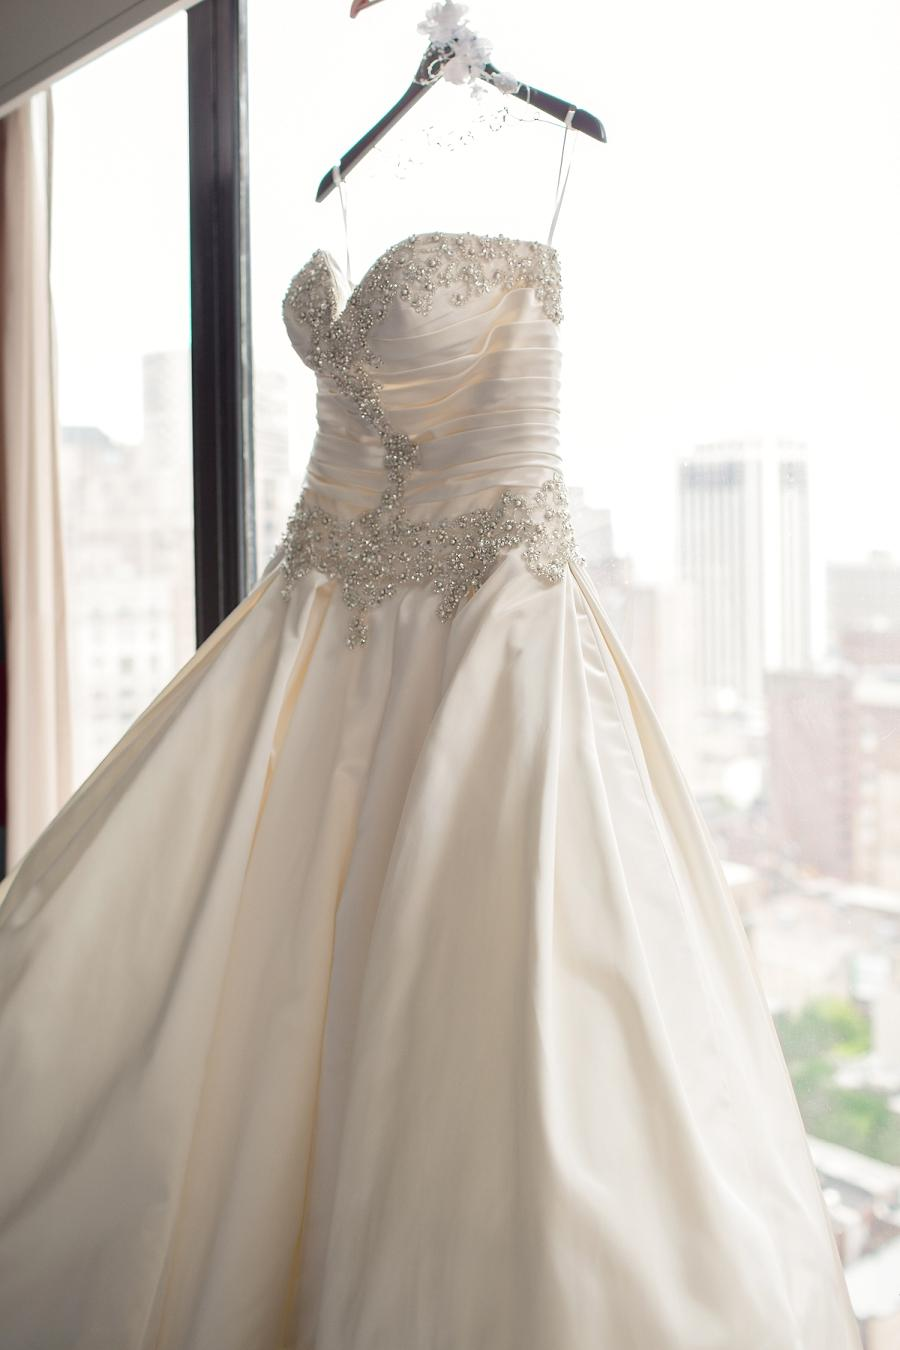 Pyramid-Club-Philadelphia-Wedding-by-Adrienne-Matz-Photography_0001